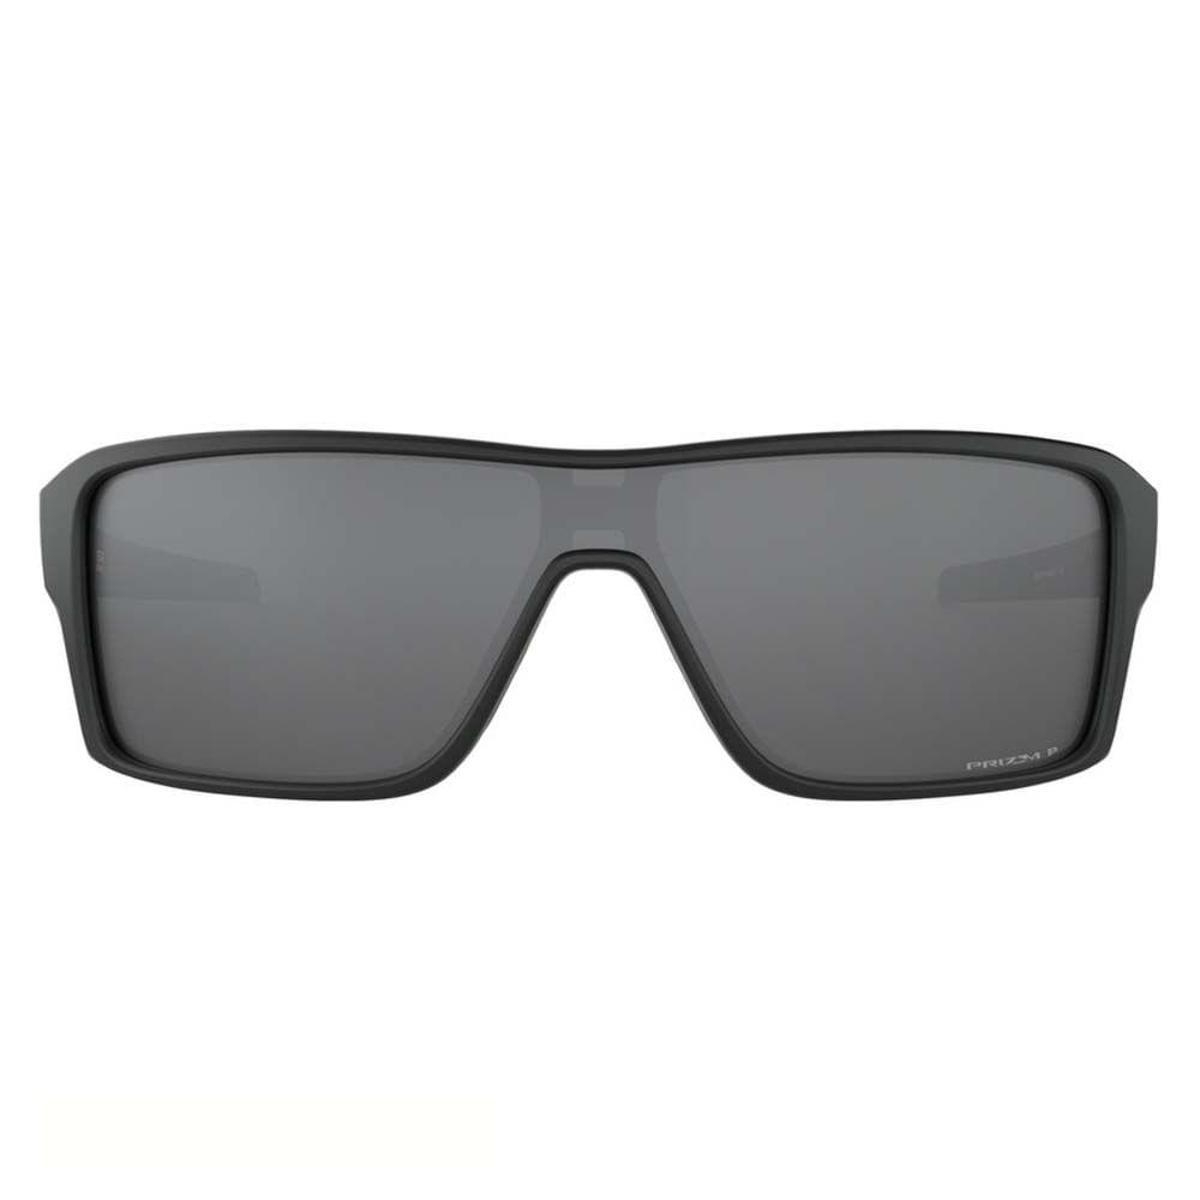 d15f8ae600c69 Óculos Oakley Ridgeline Matte  Óculos Oakley Ridgeline Matte ...